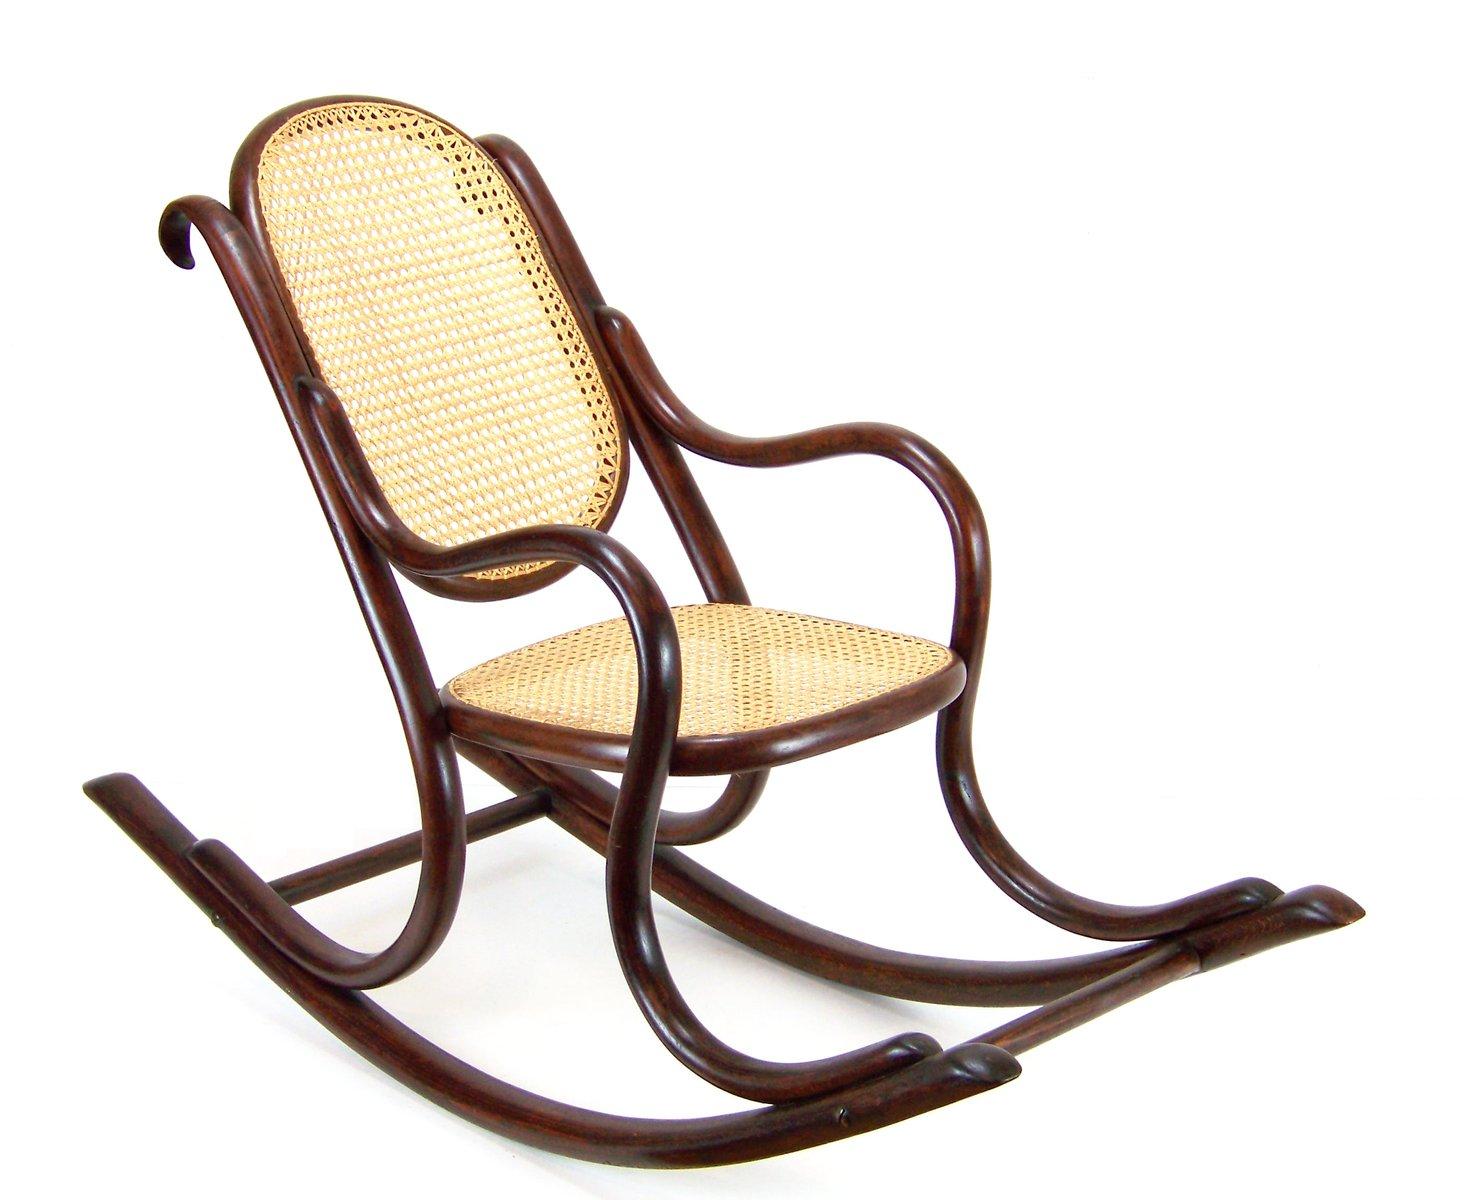 number 2 kinder schaukelstuhl von fischel 1890er bei. Black Bedroom Furniture Sets. Home Design Ideas